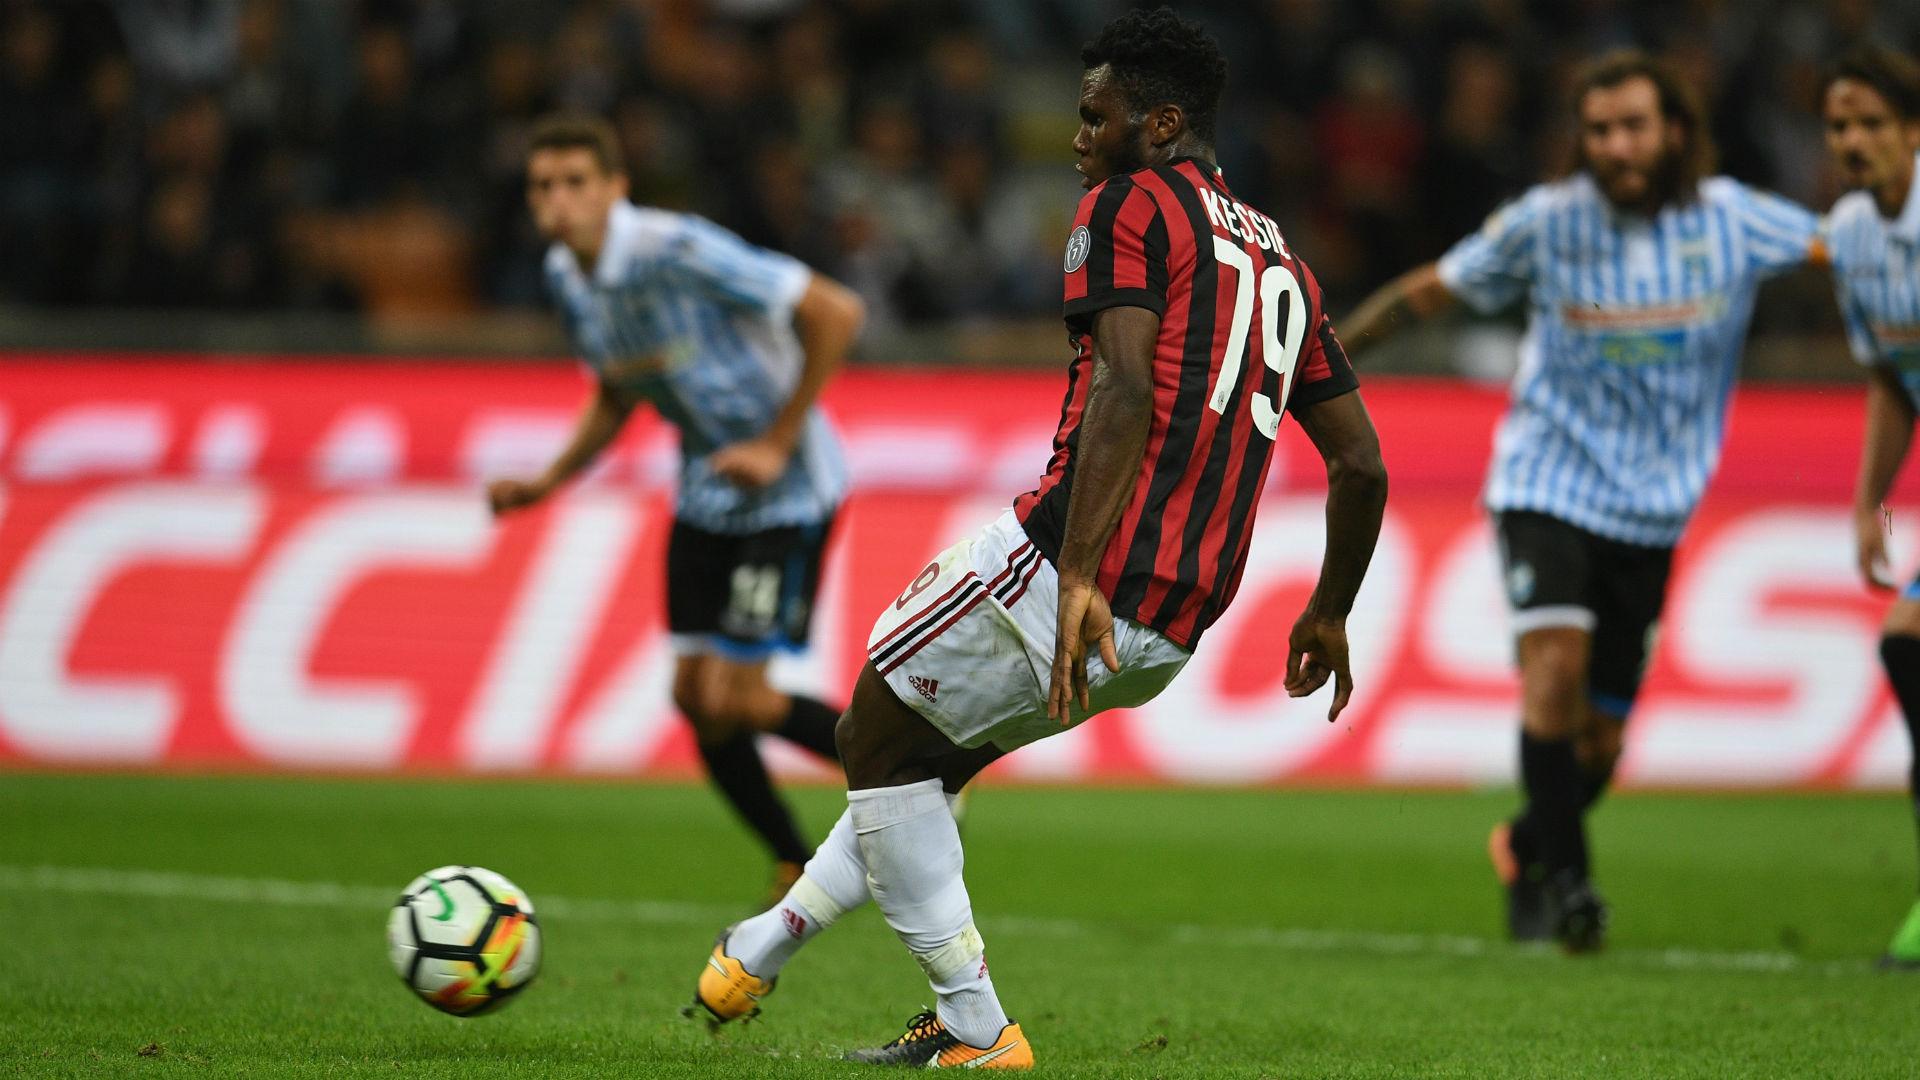 Milan-Spal 2-0, vittoria di rigore per i rossoneri